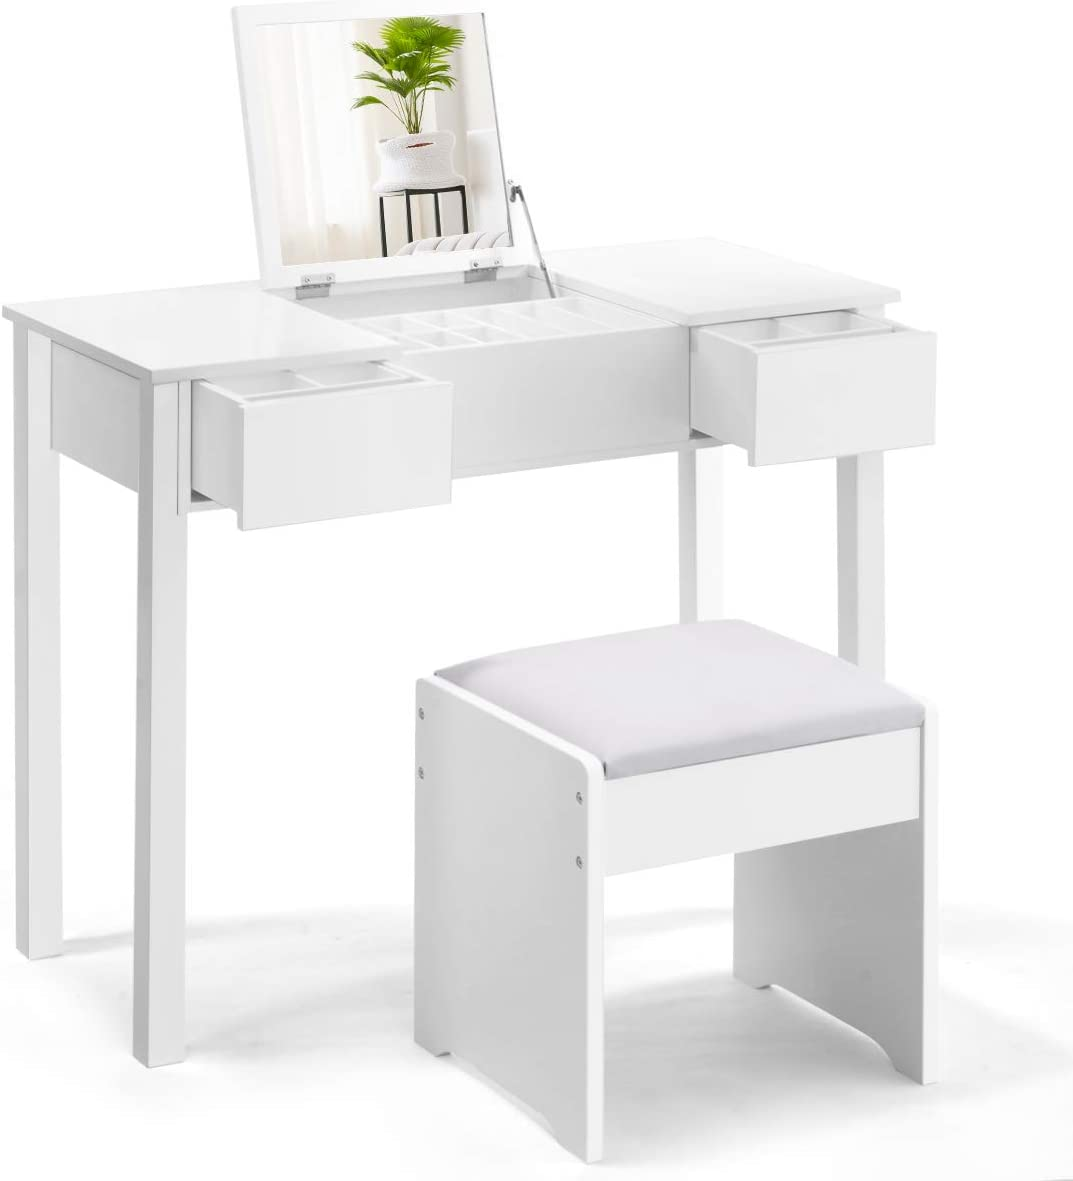 Vanity Makeup Dressing Table Set Girl Makeup Desk W//Flip up Mirror Stool White